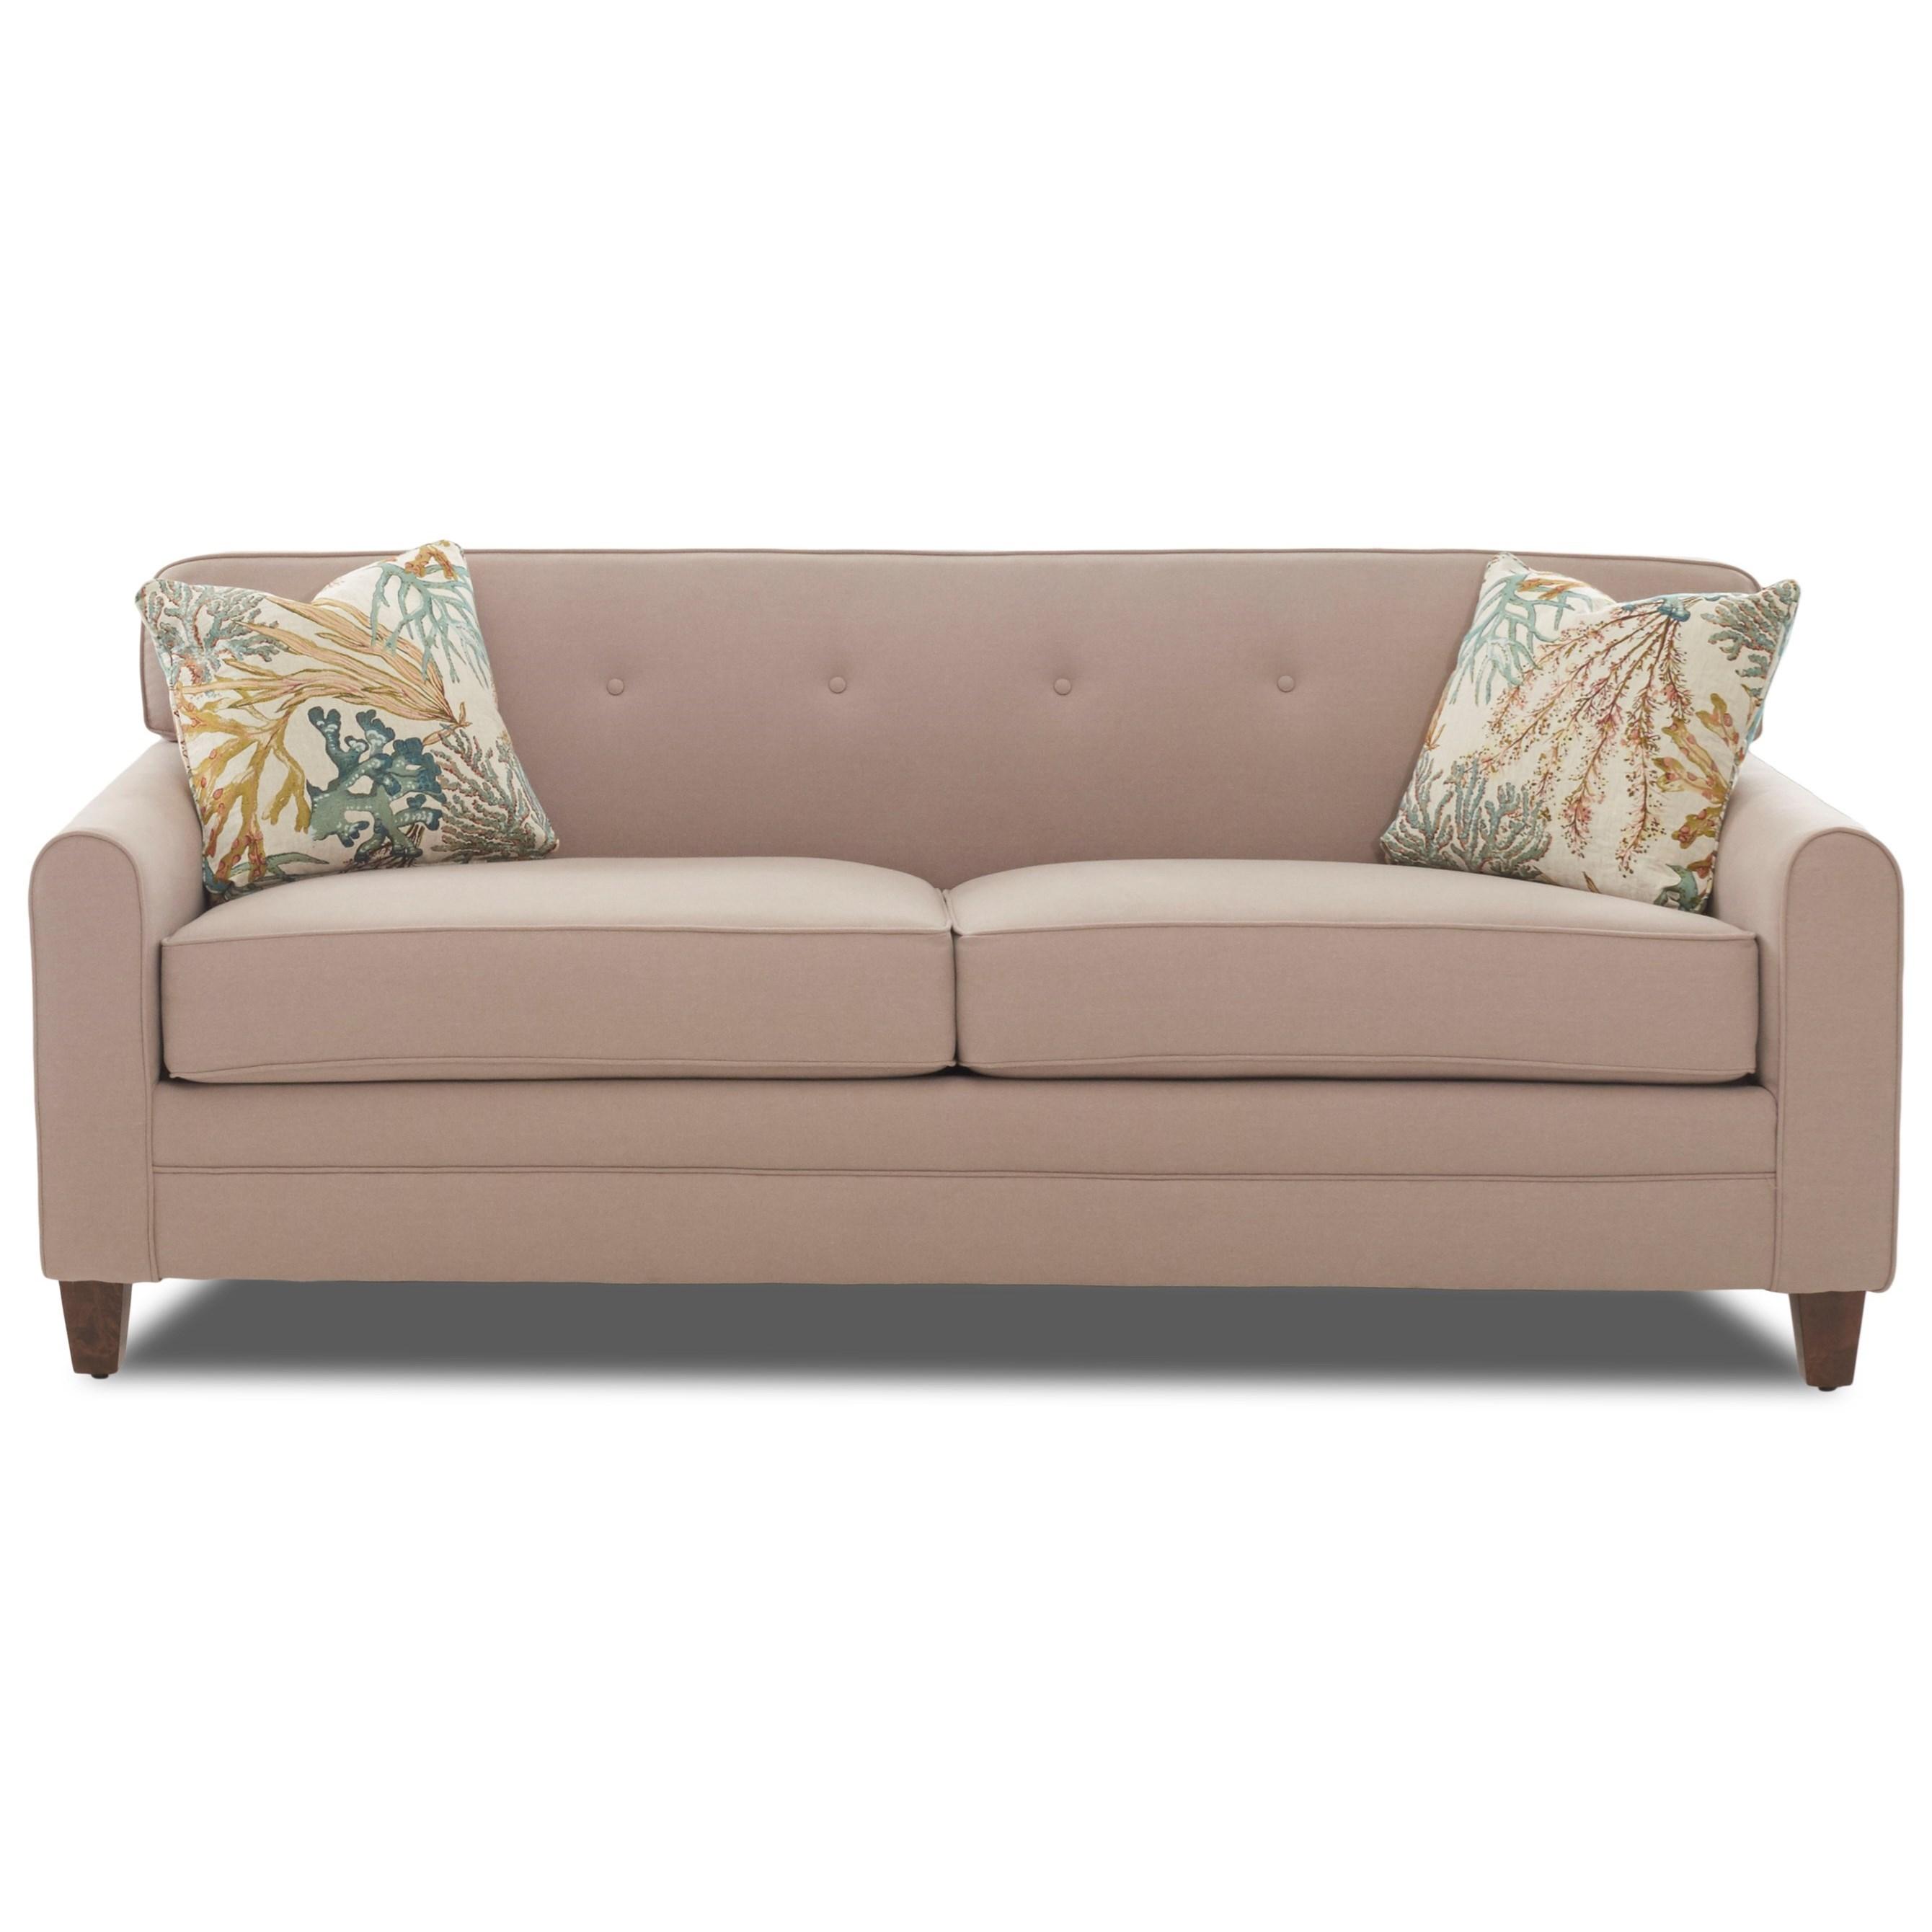 queen sleeper sofa memory foam mattress kmart inflatable bed elliston place peyton mid century modern with enso peytonenso